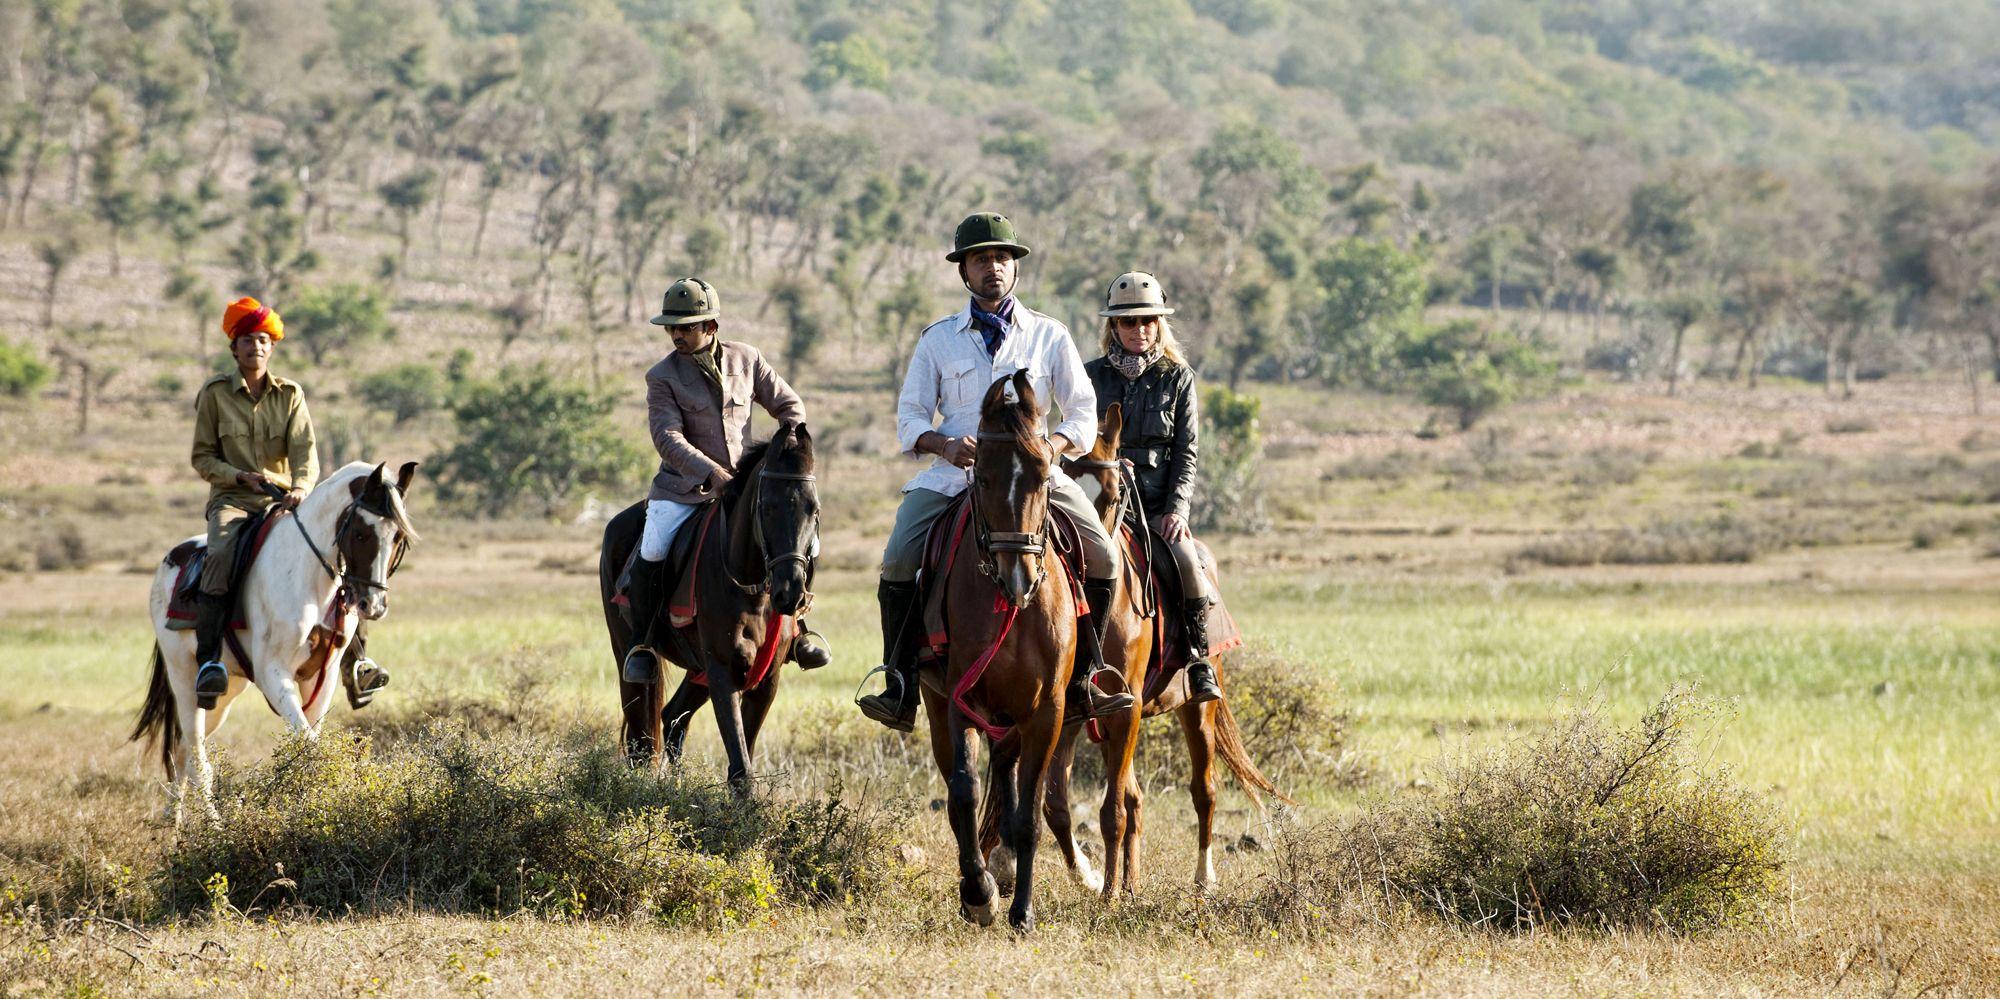 Bijaipur Tours Horses Small Group Tours Safari